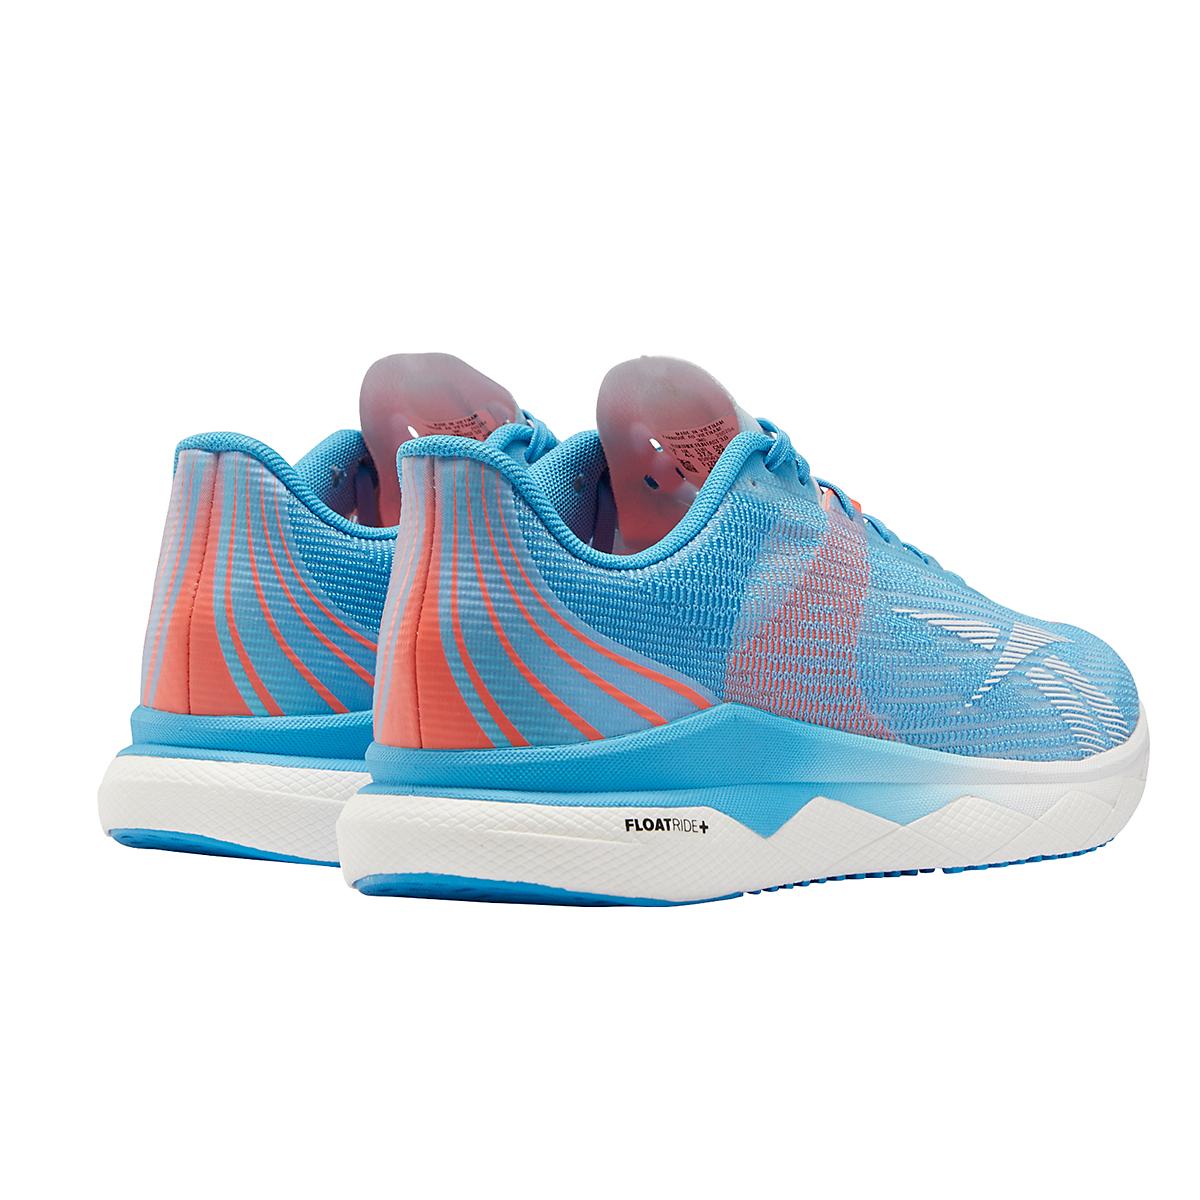 Women's Reebok Floatride Run Fast 3.0 Running Shoe - Color: Radiant Aqua /Orange Flare /White - Size: 5 - Width: Regular, Radiant Aqua /Orange Flare /White, large, image 4